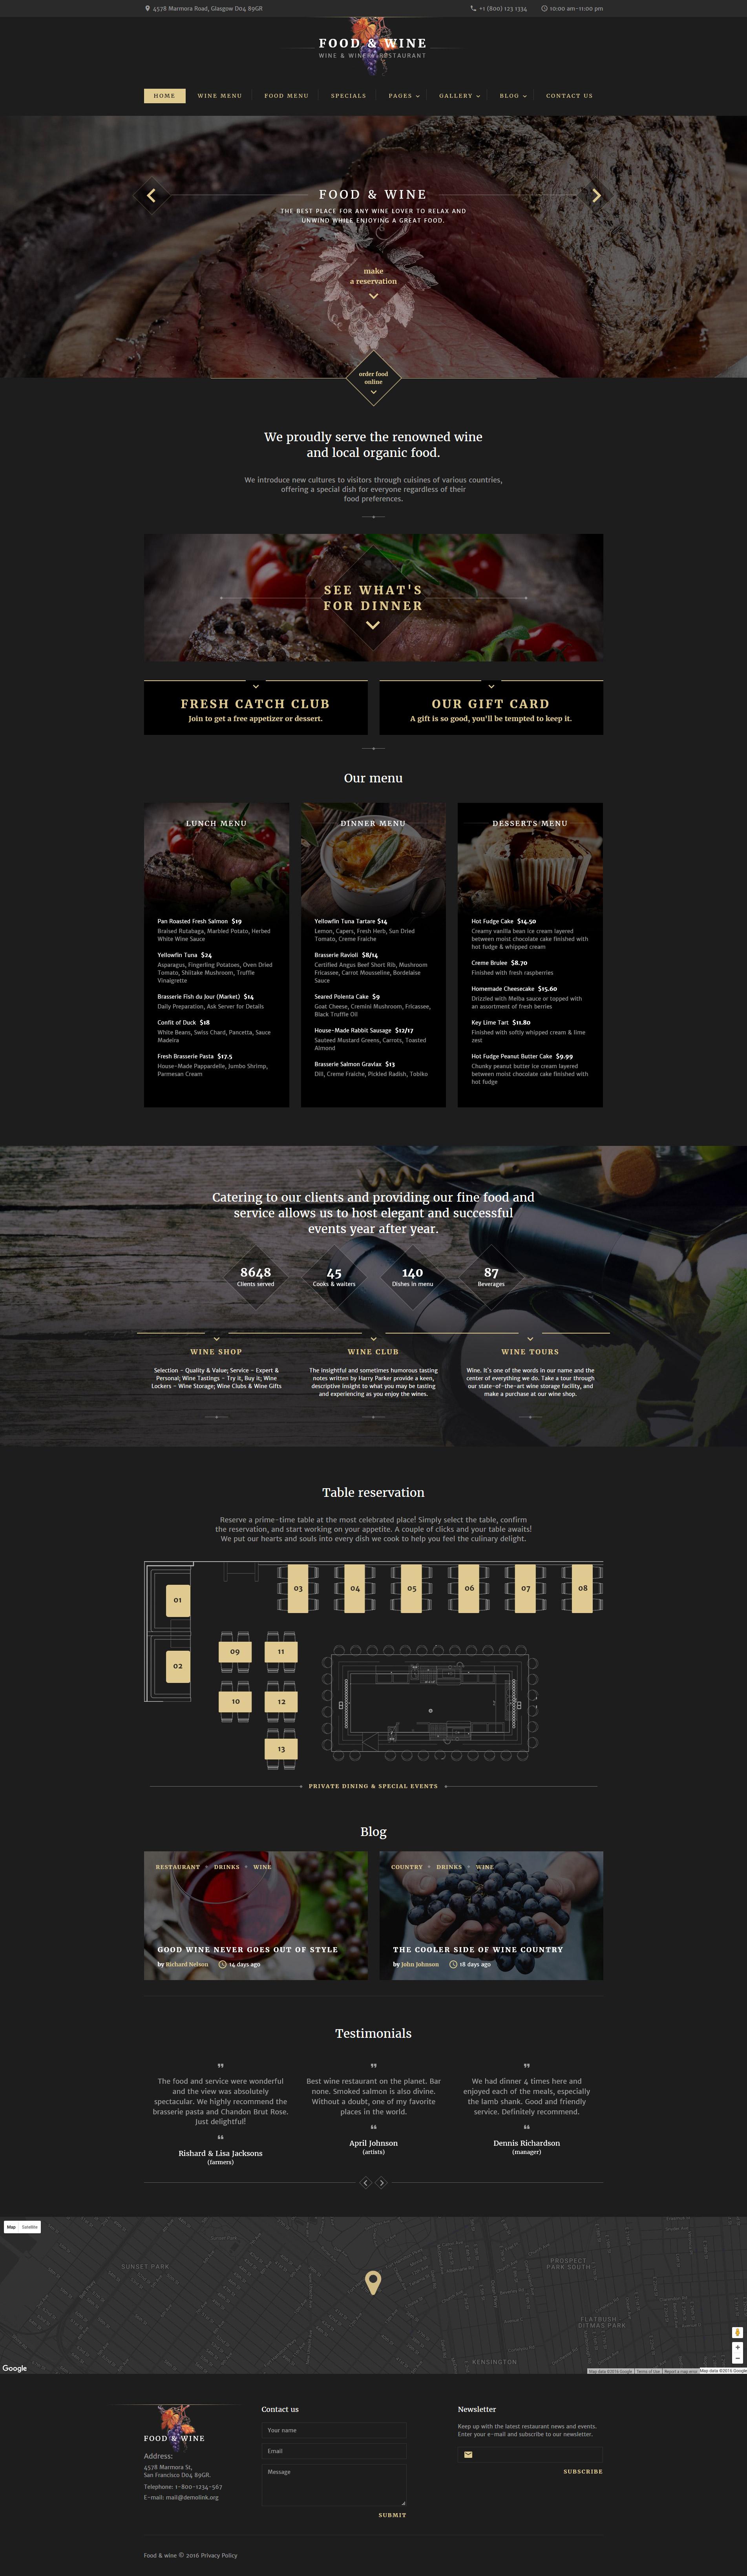 Responsive Food  Wine Web Sitesi #60038 - Ekran resmi